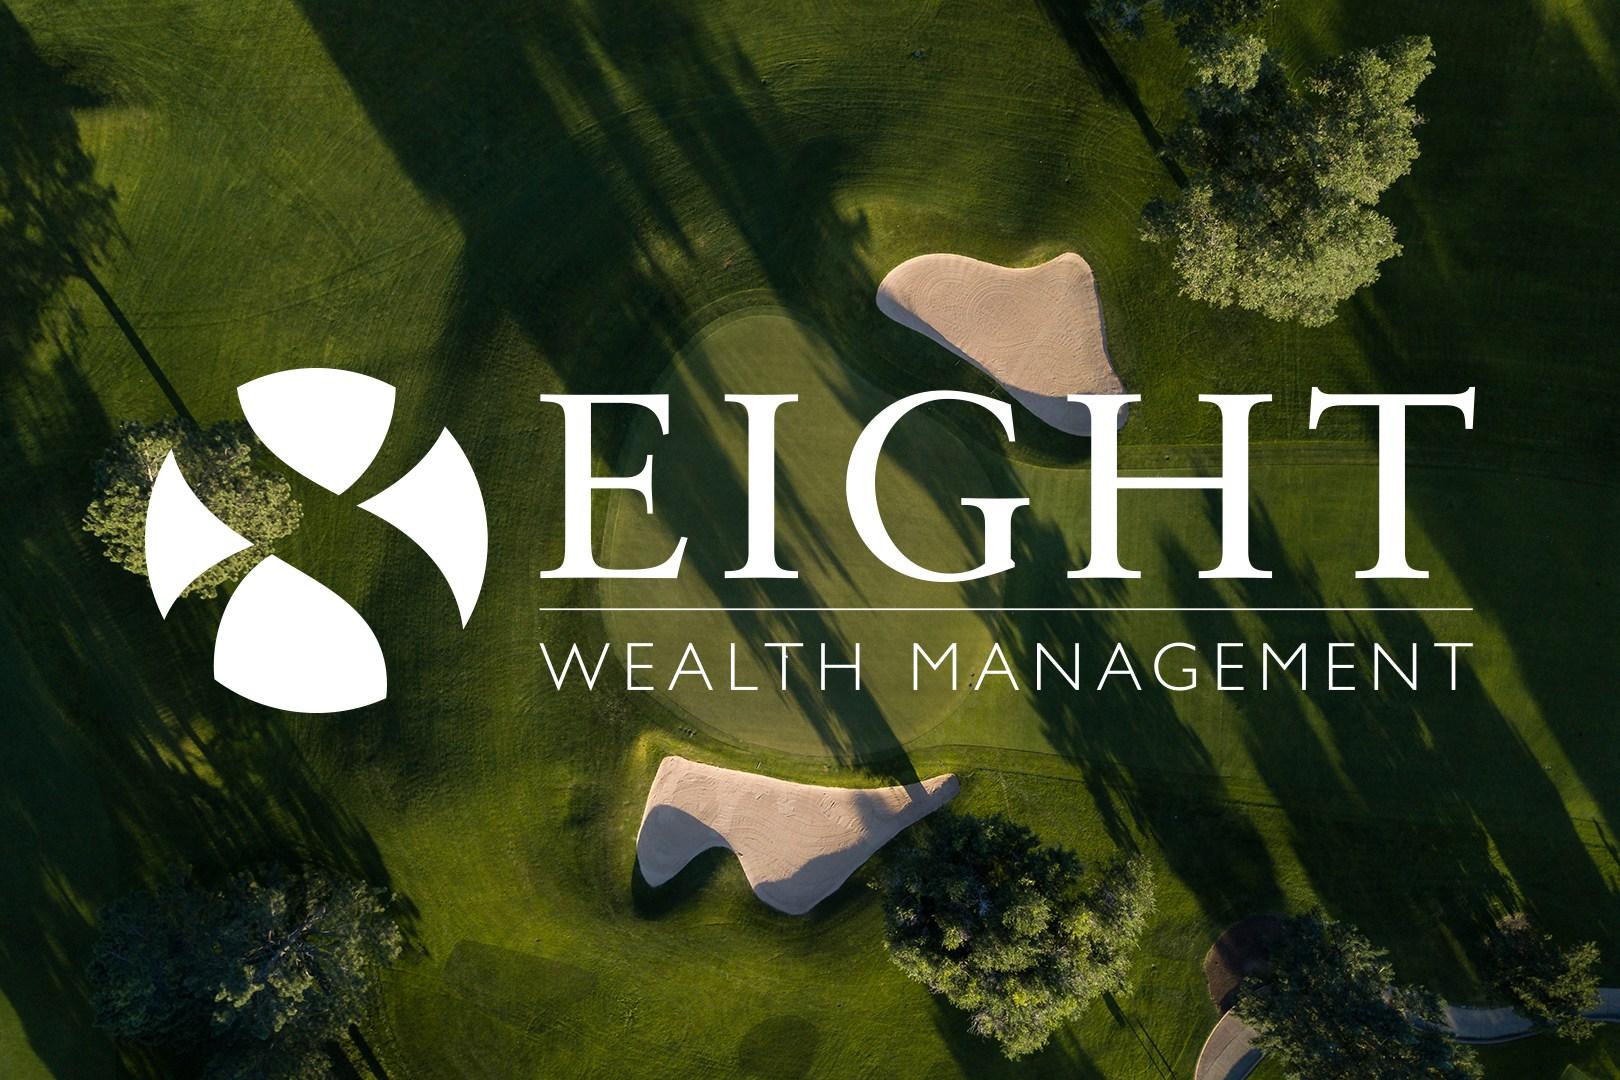 Eight-Wealth-Management-Charity-Golf-Event (1).jpg